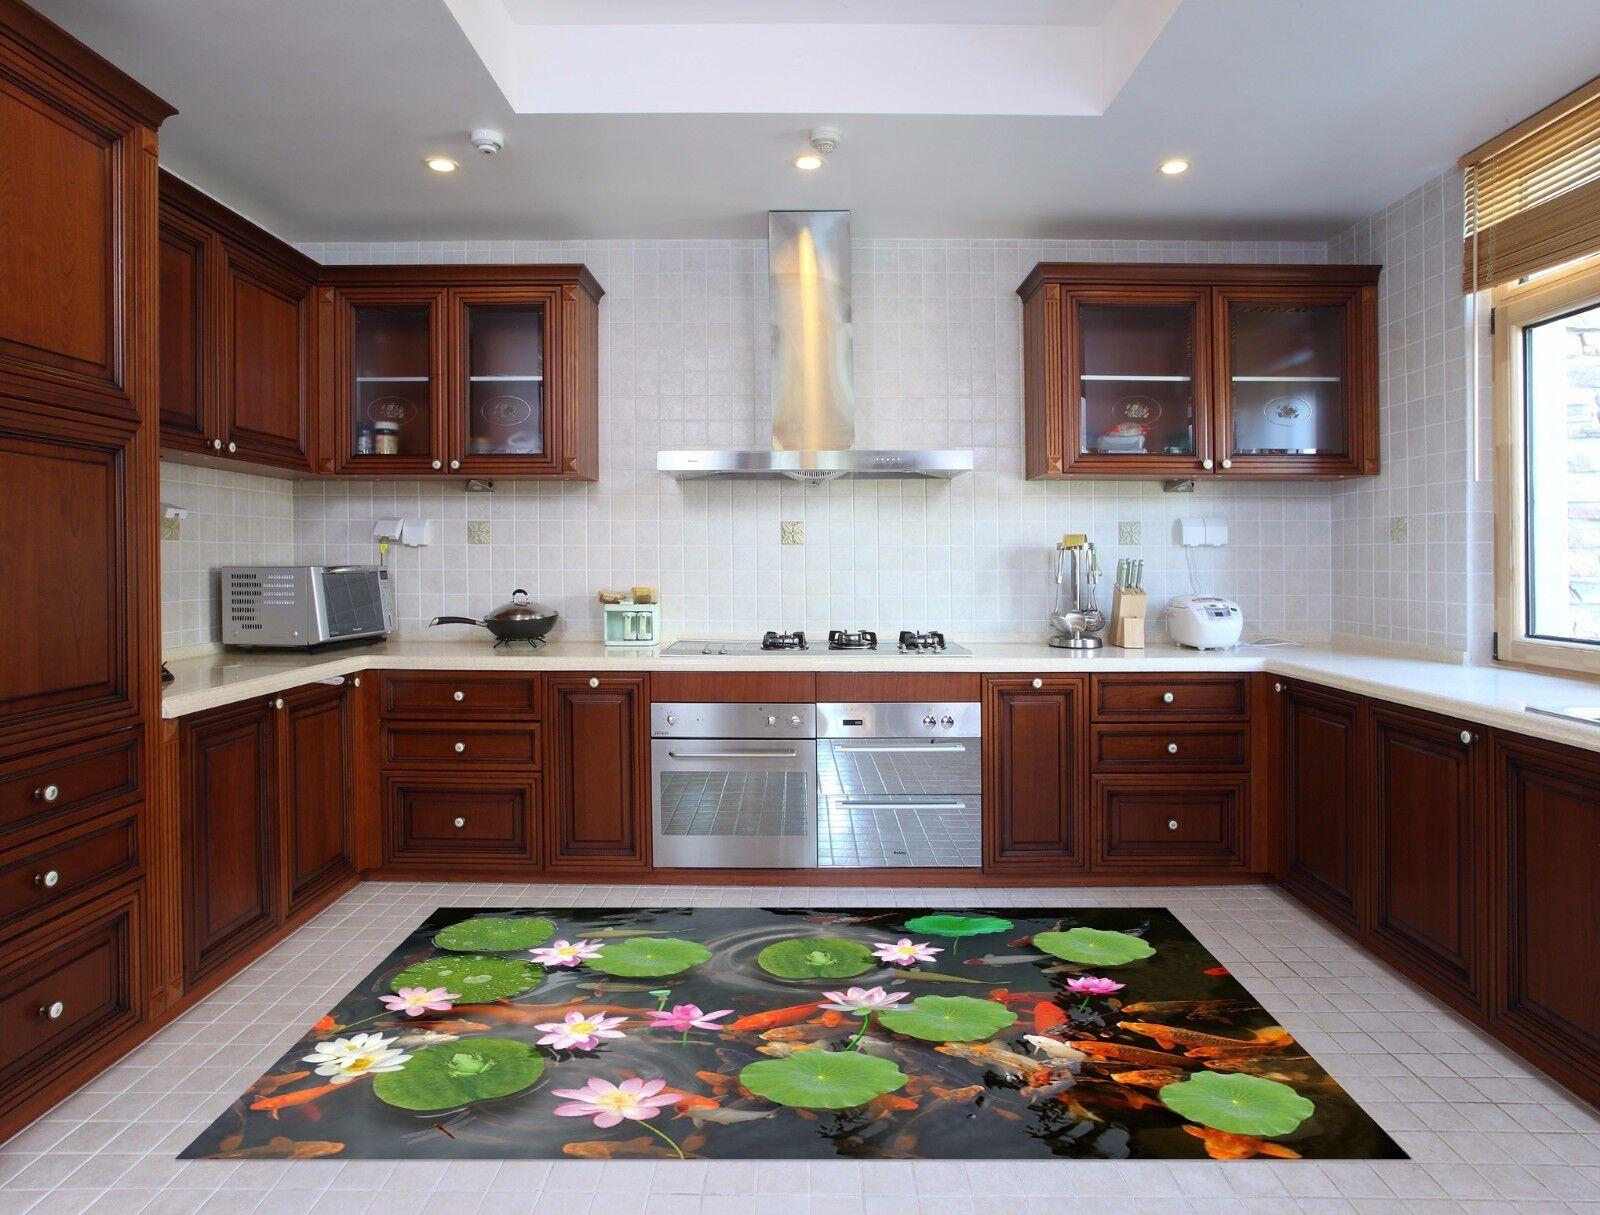 3D Pond Lotus 738 Kitchen Mat Floor Murals Wall Print Wall AJ WALLPAPER UK Kyra